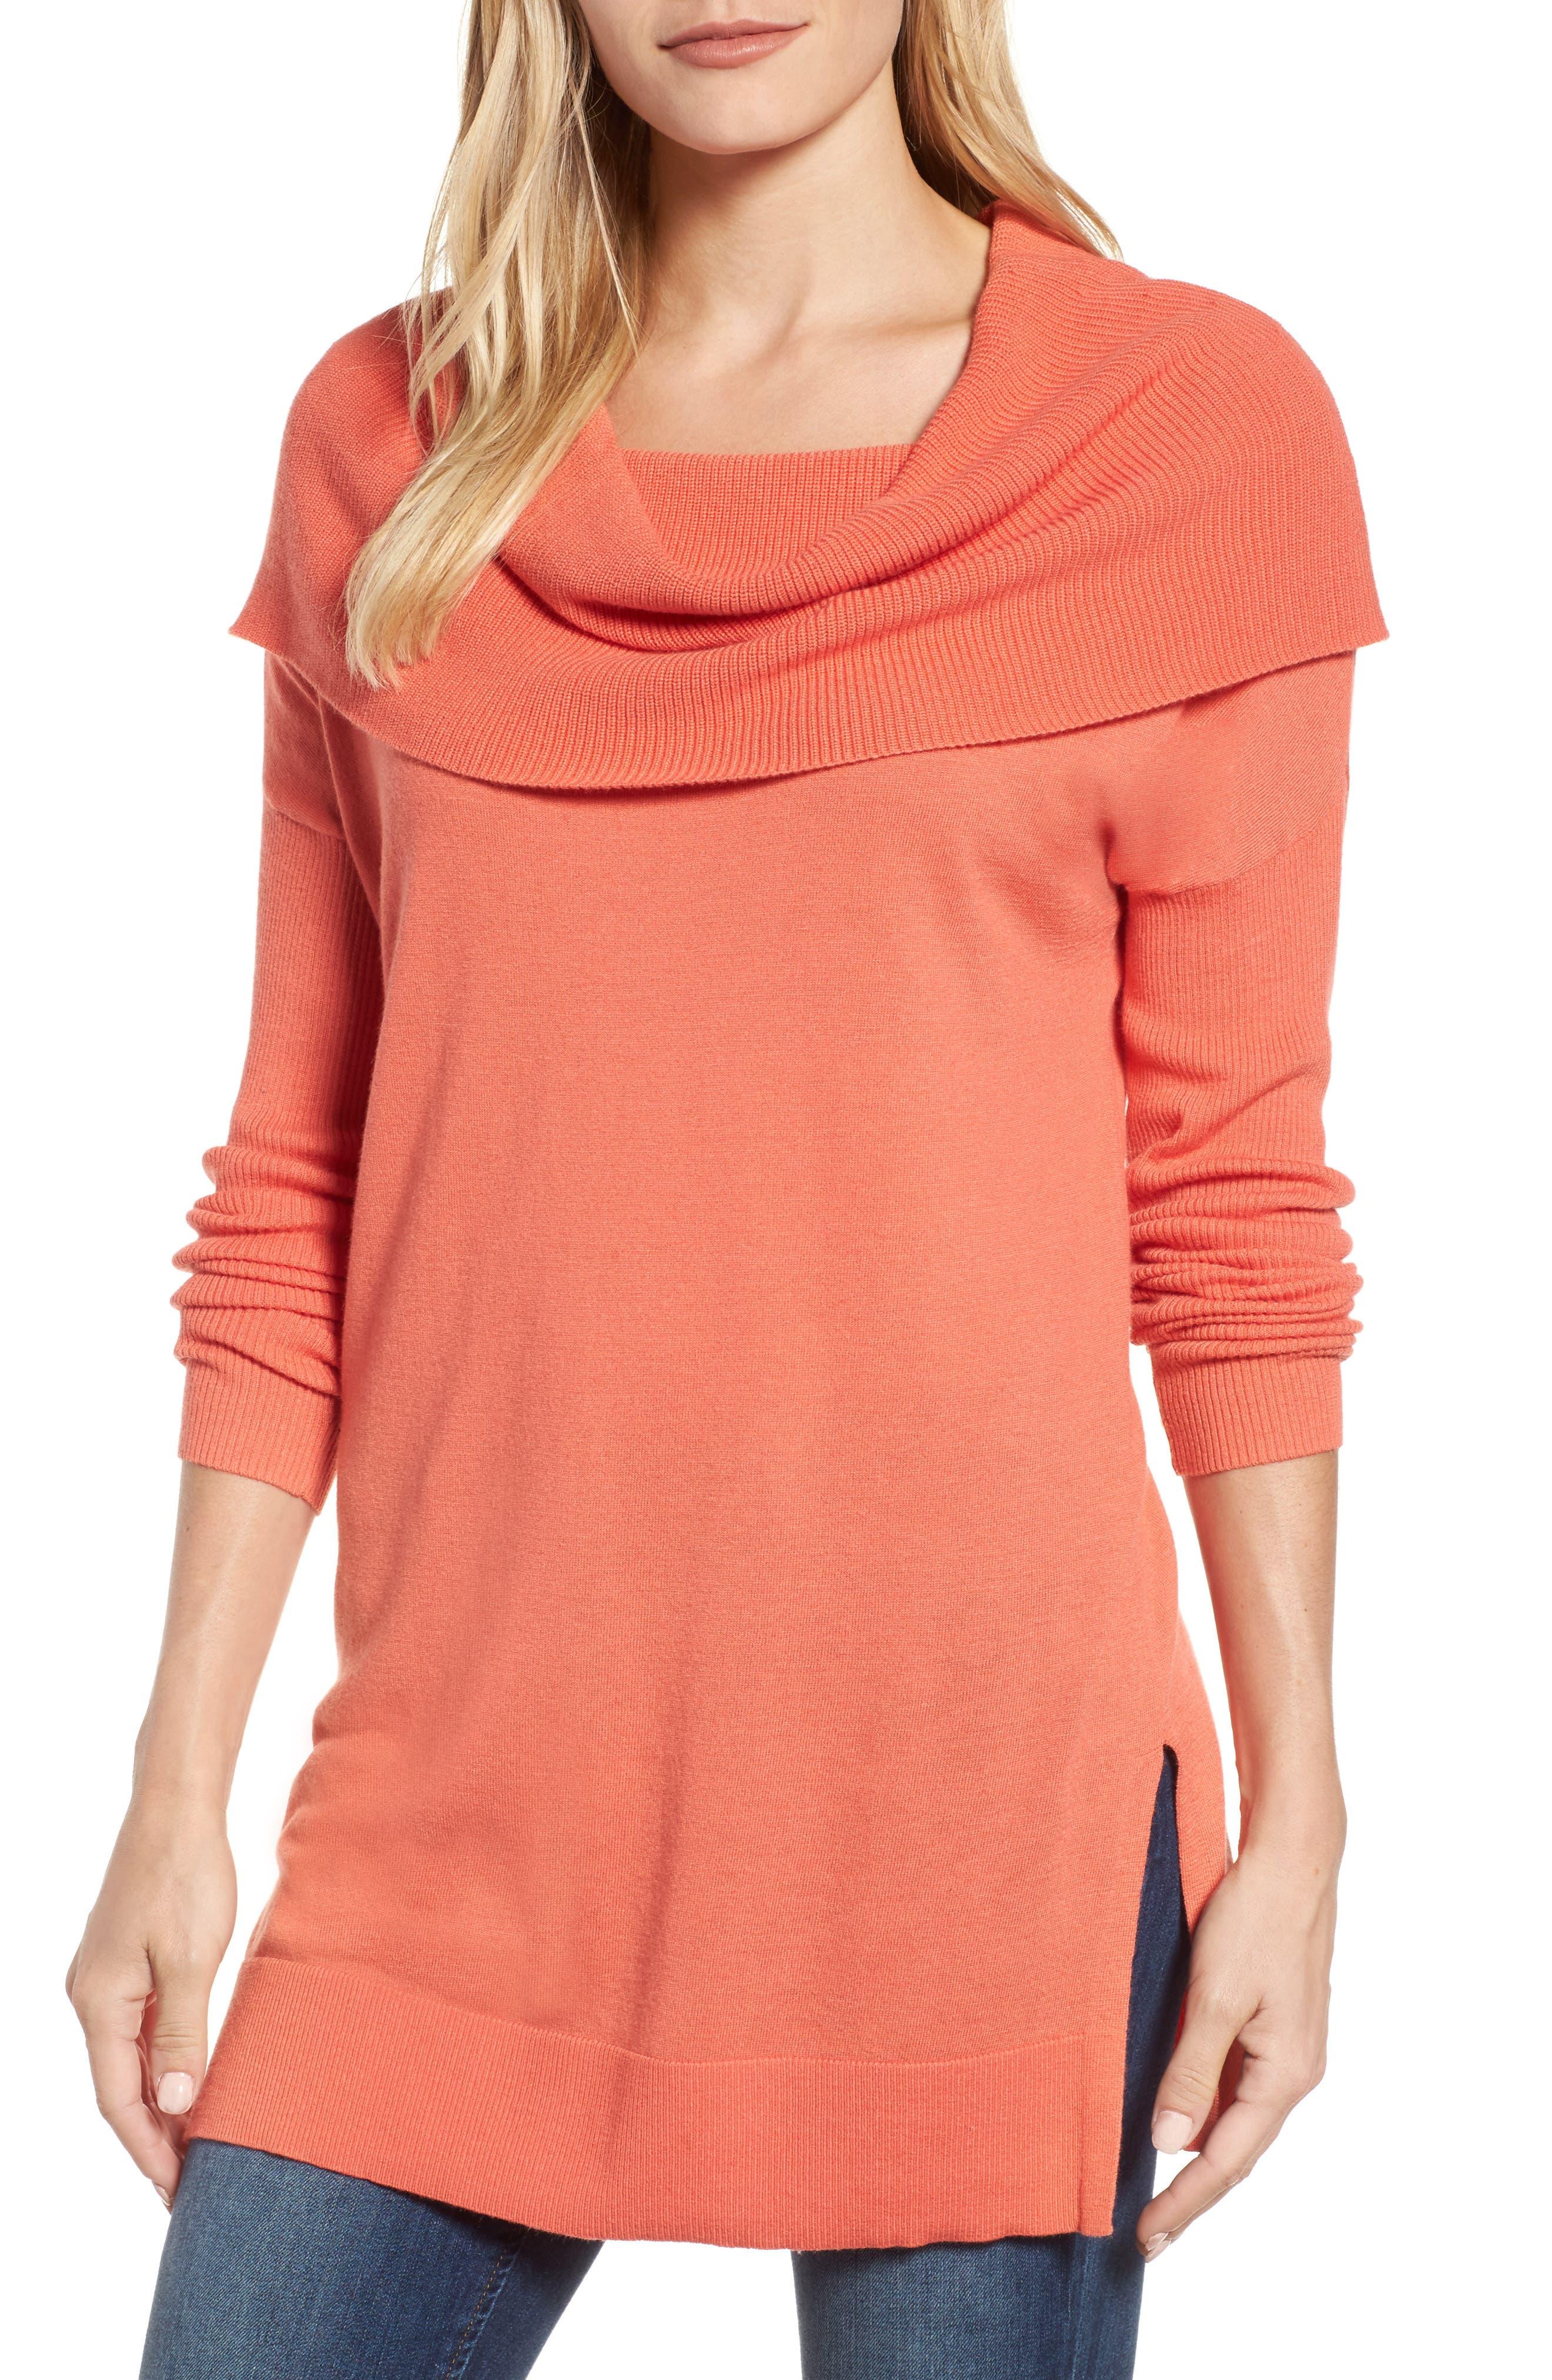 Women's Pink Cowl Neck Sweaters   Nordstrom